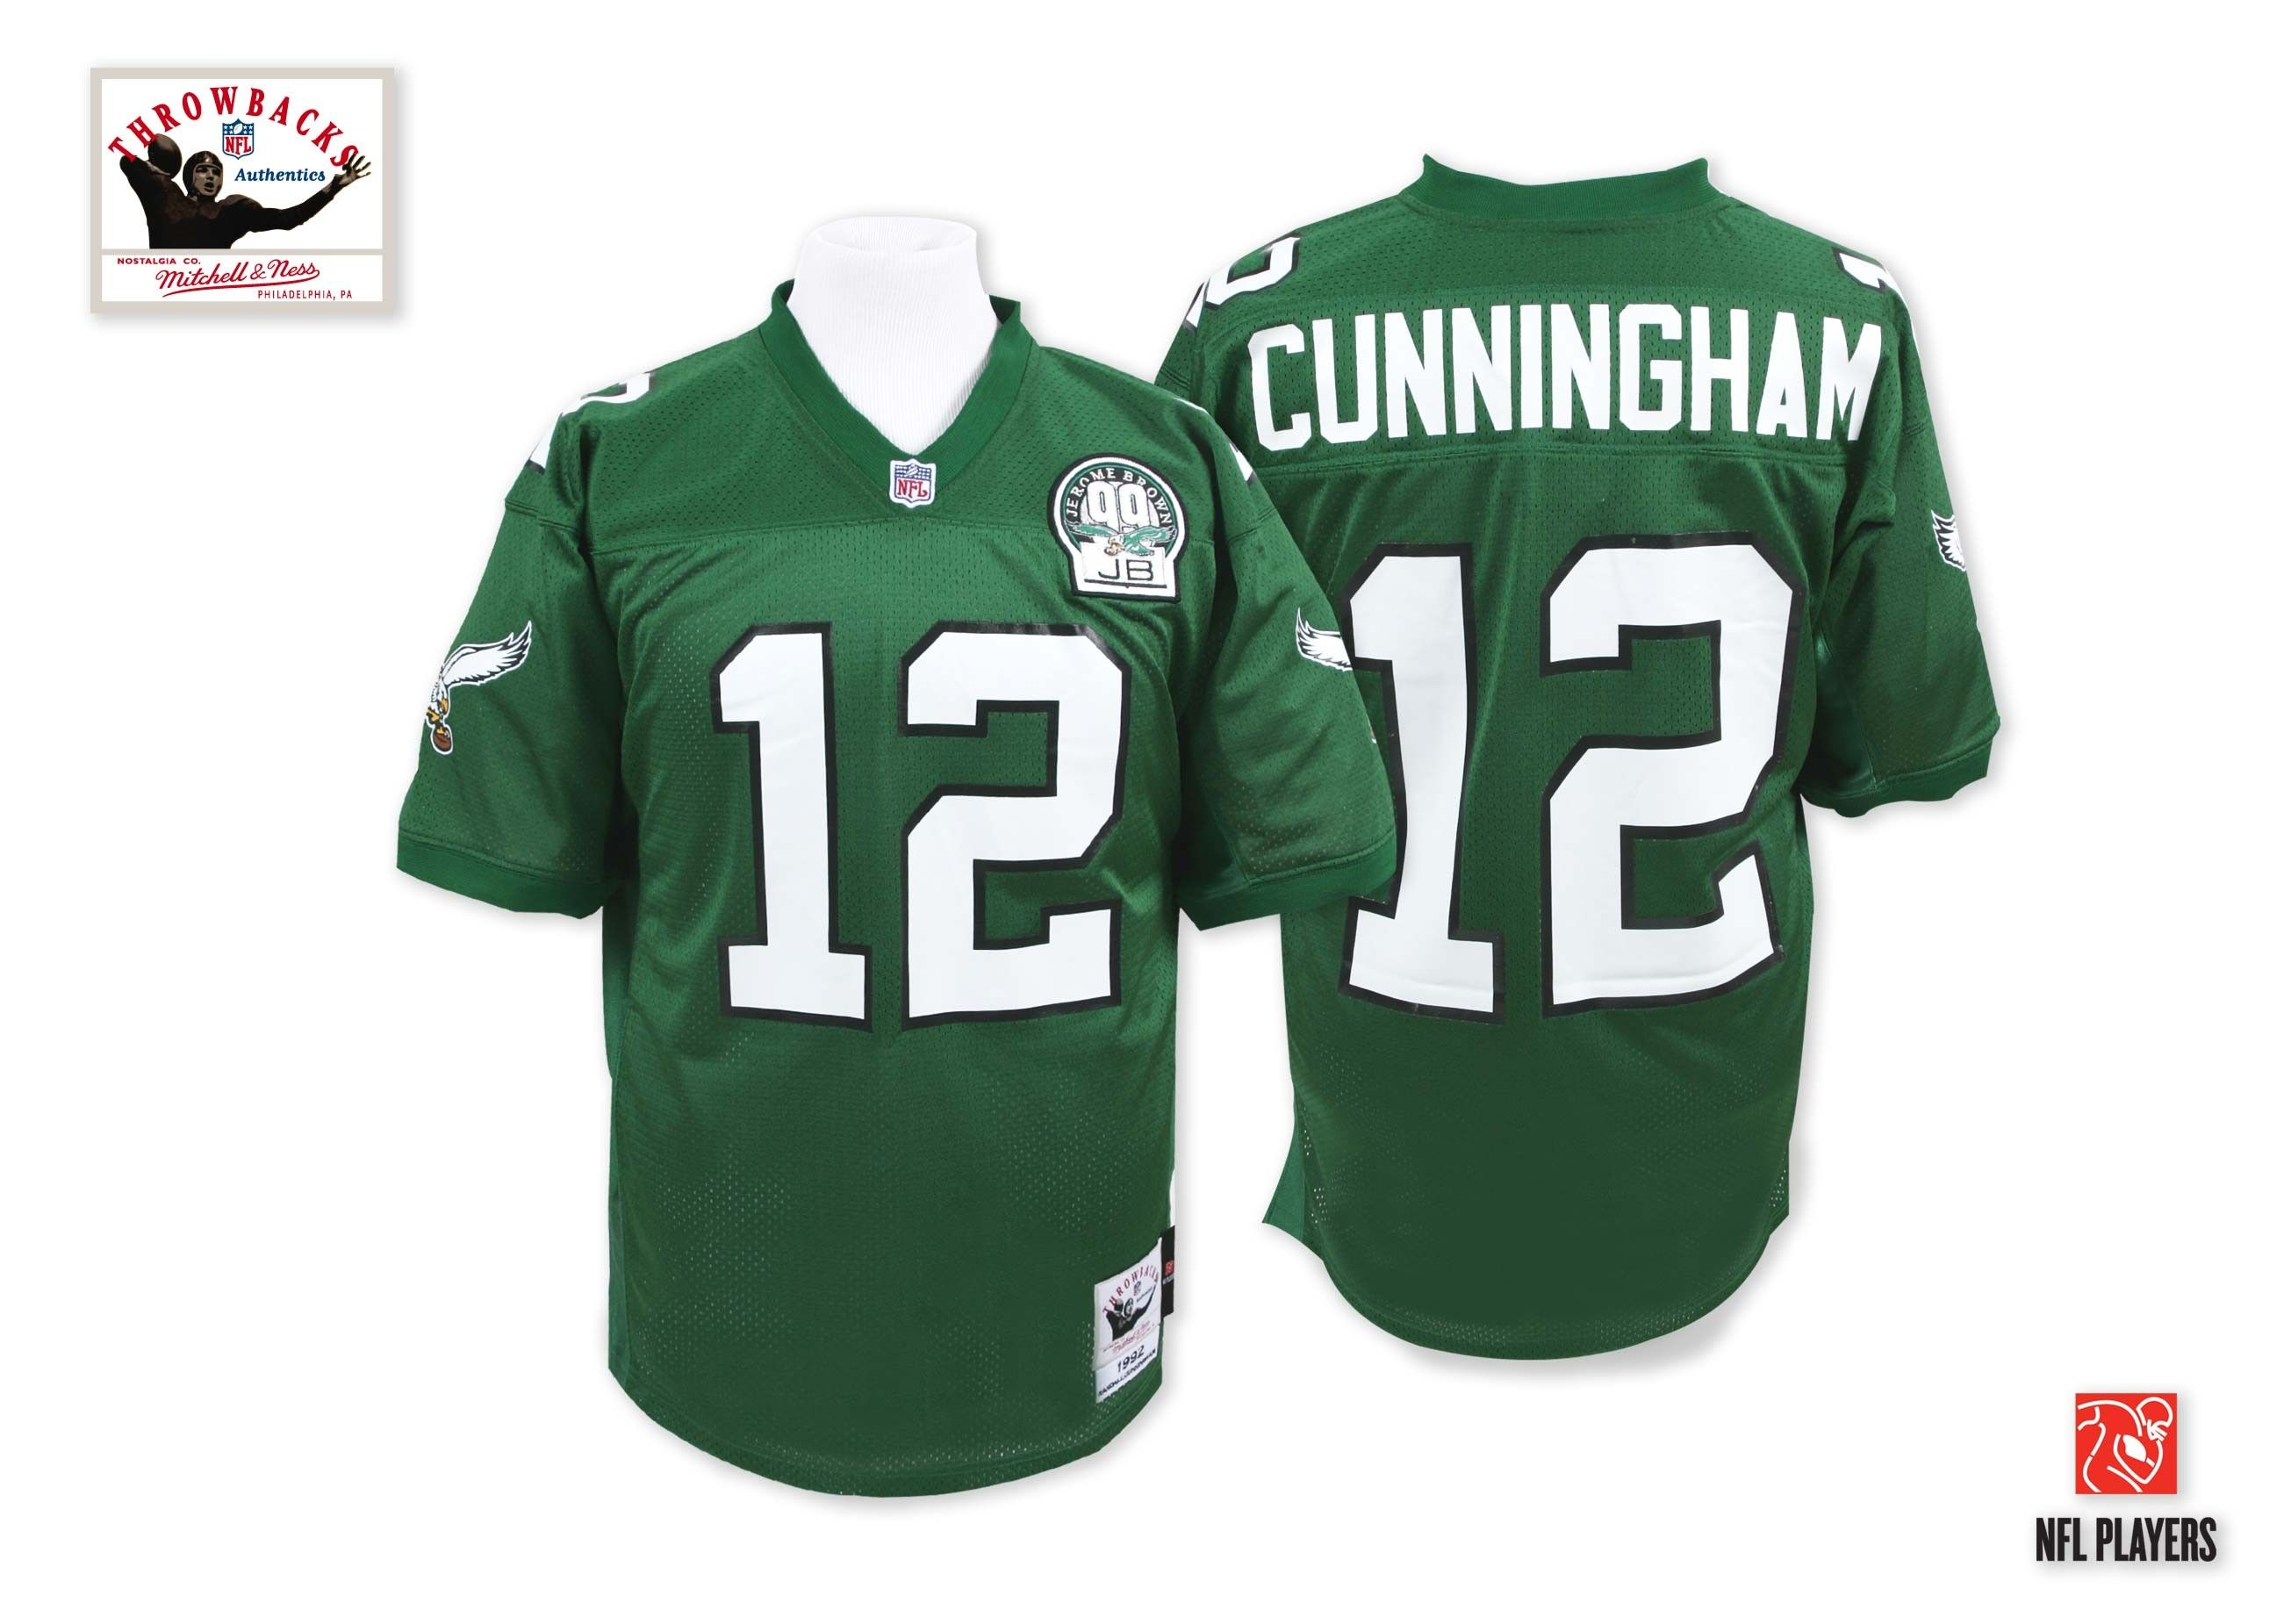 5db6babe Randall Cunningham 1992 Authentic Jersey Philadelphia Eagles www ...